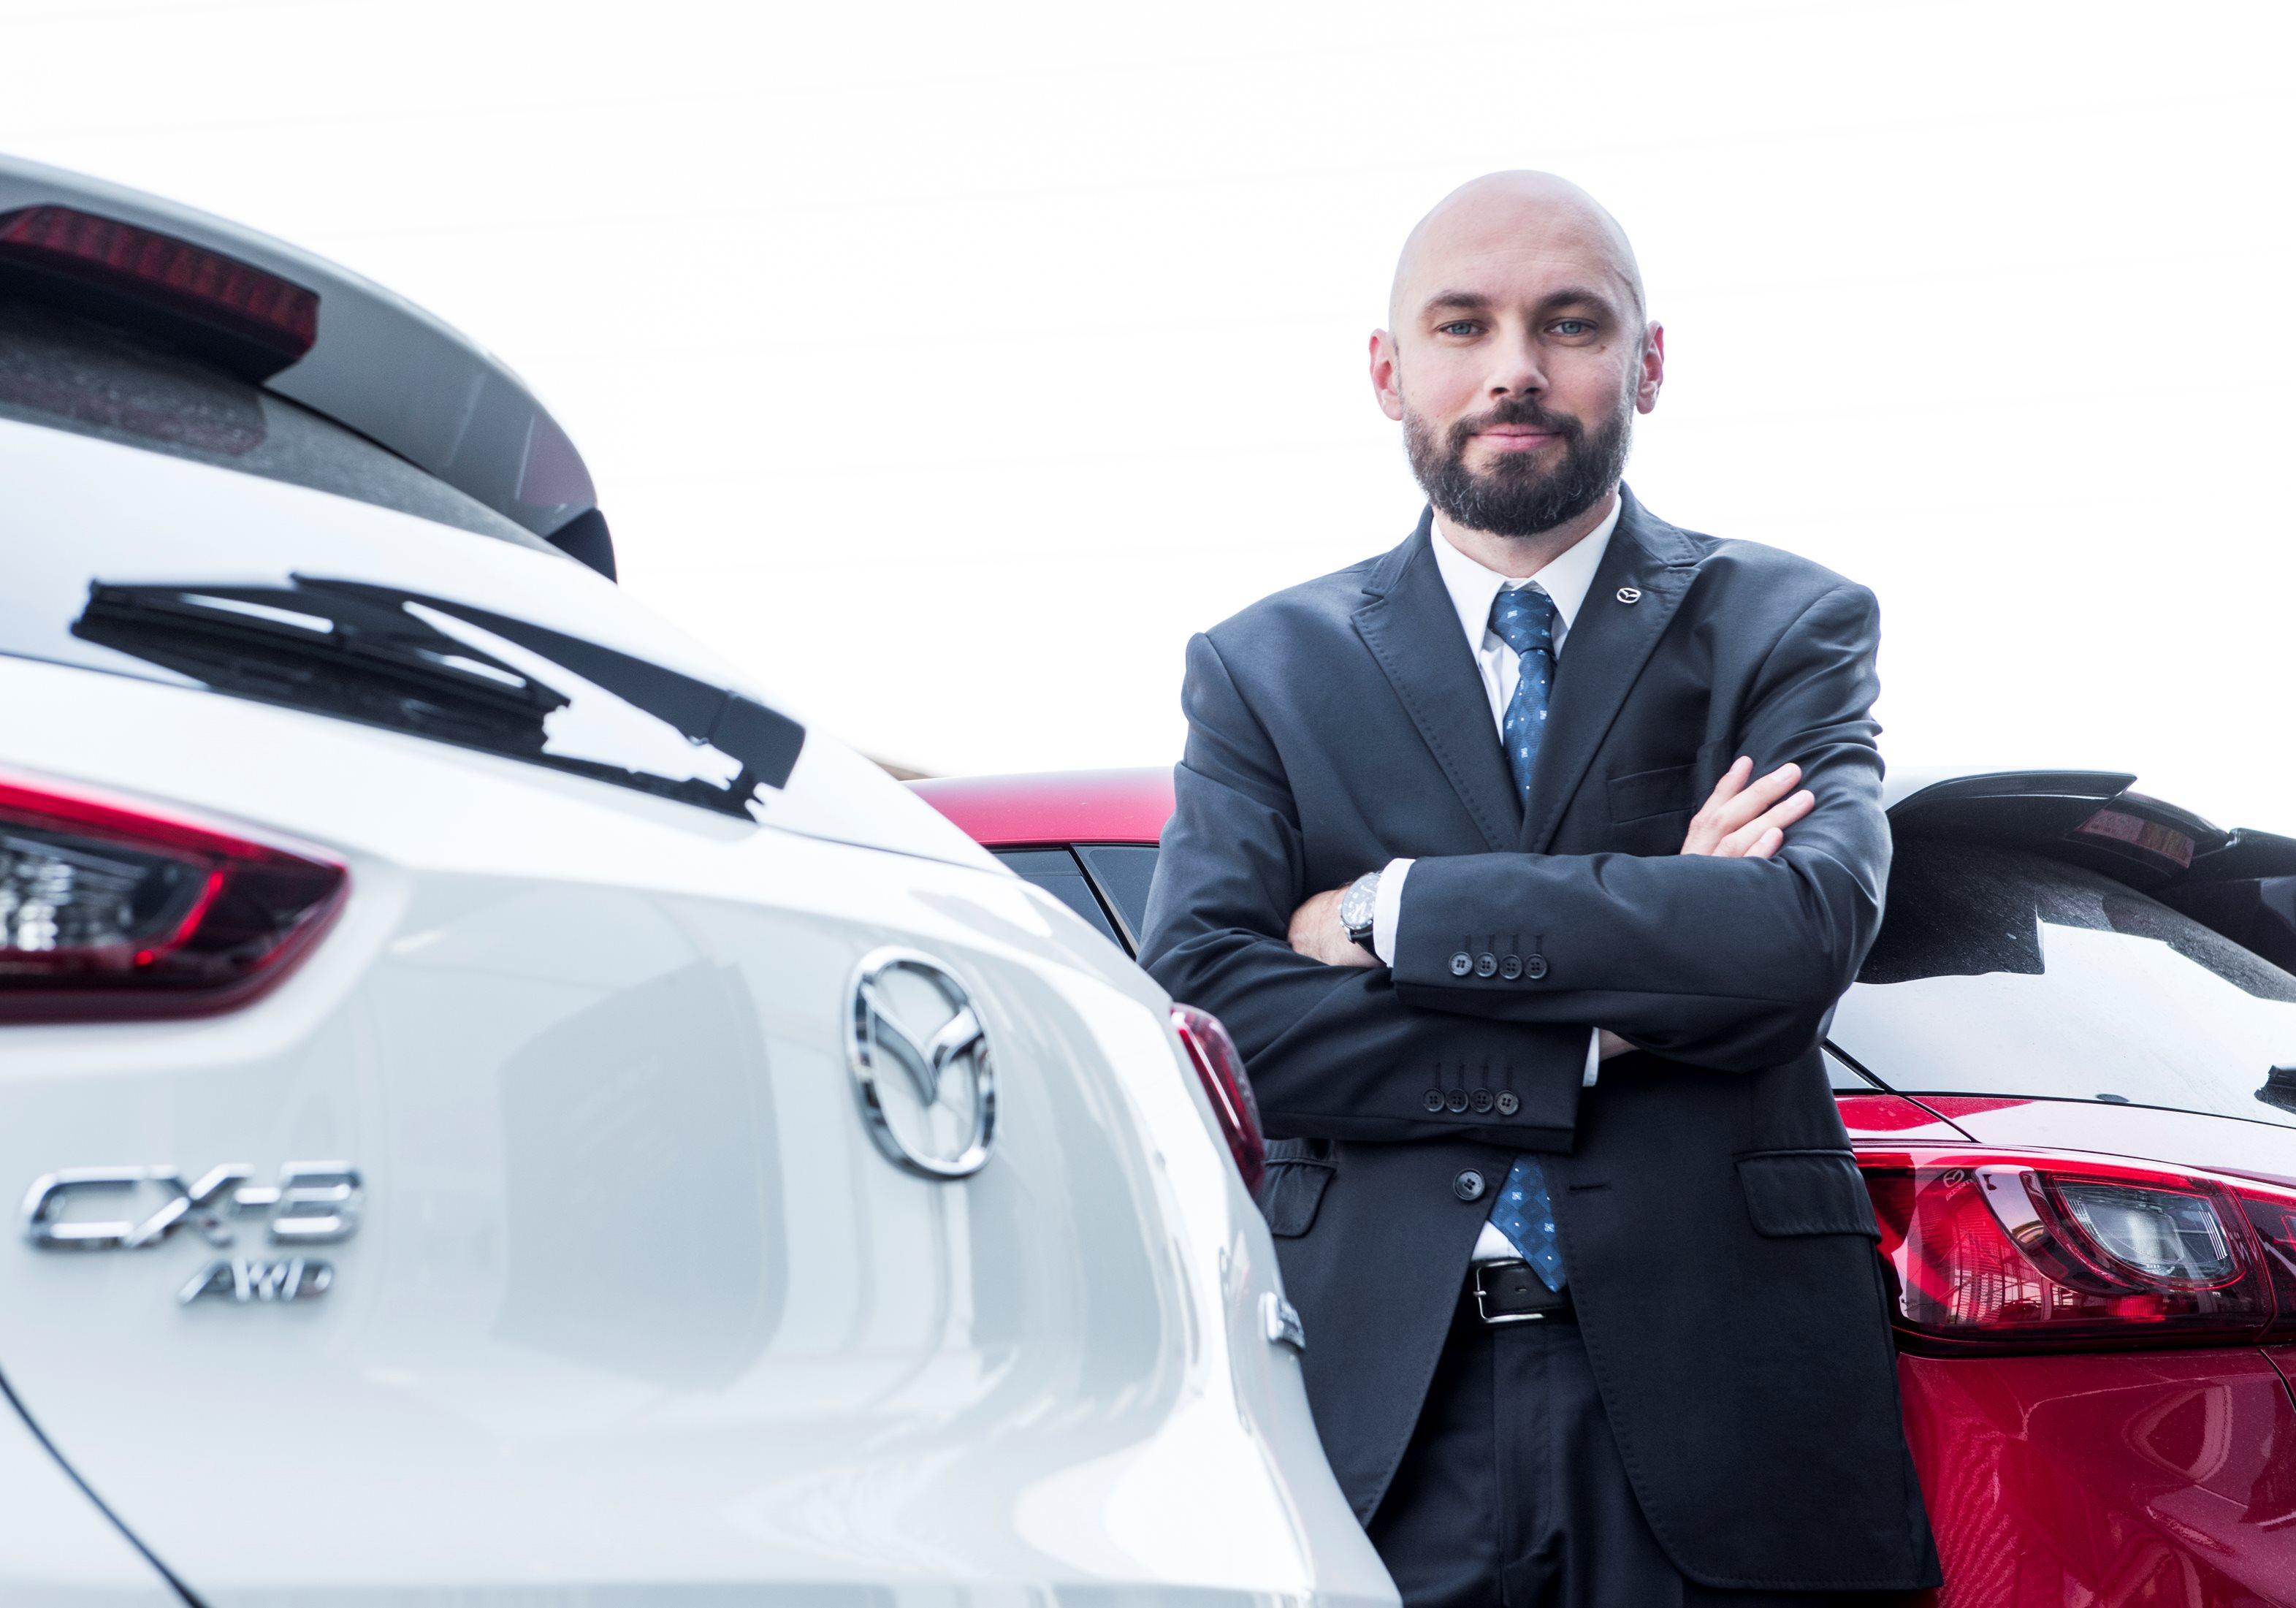 Szymon Sołtysik Dyrektorem PR Mazda Polska